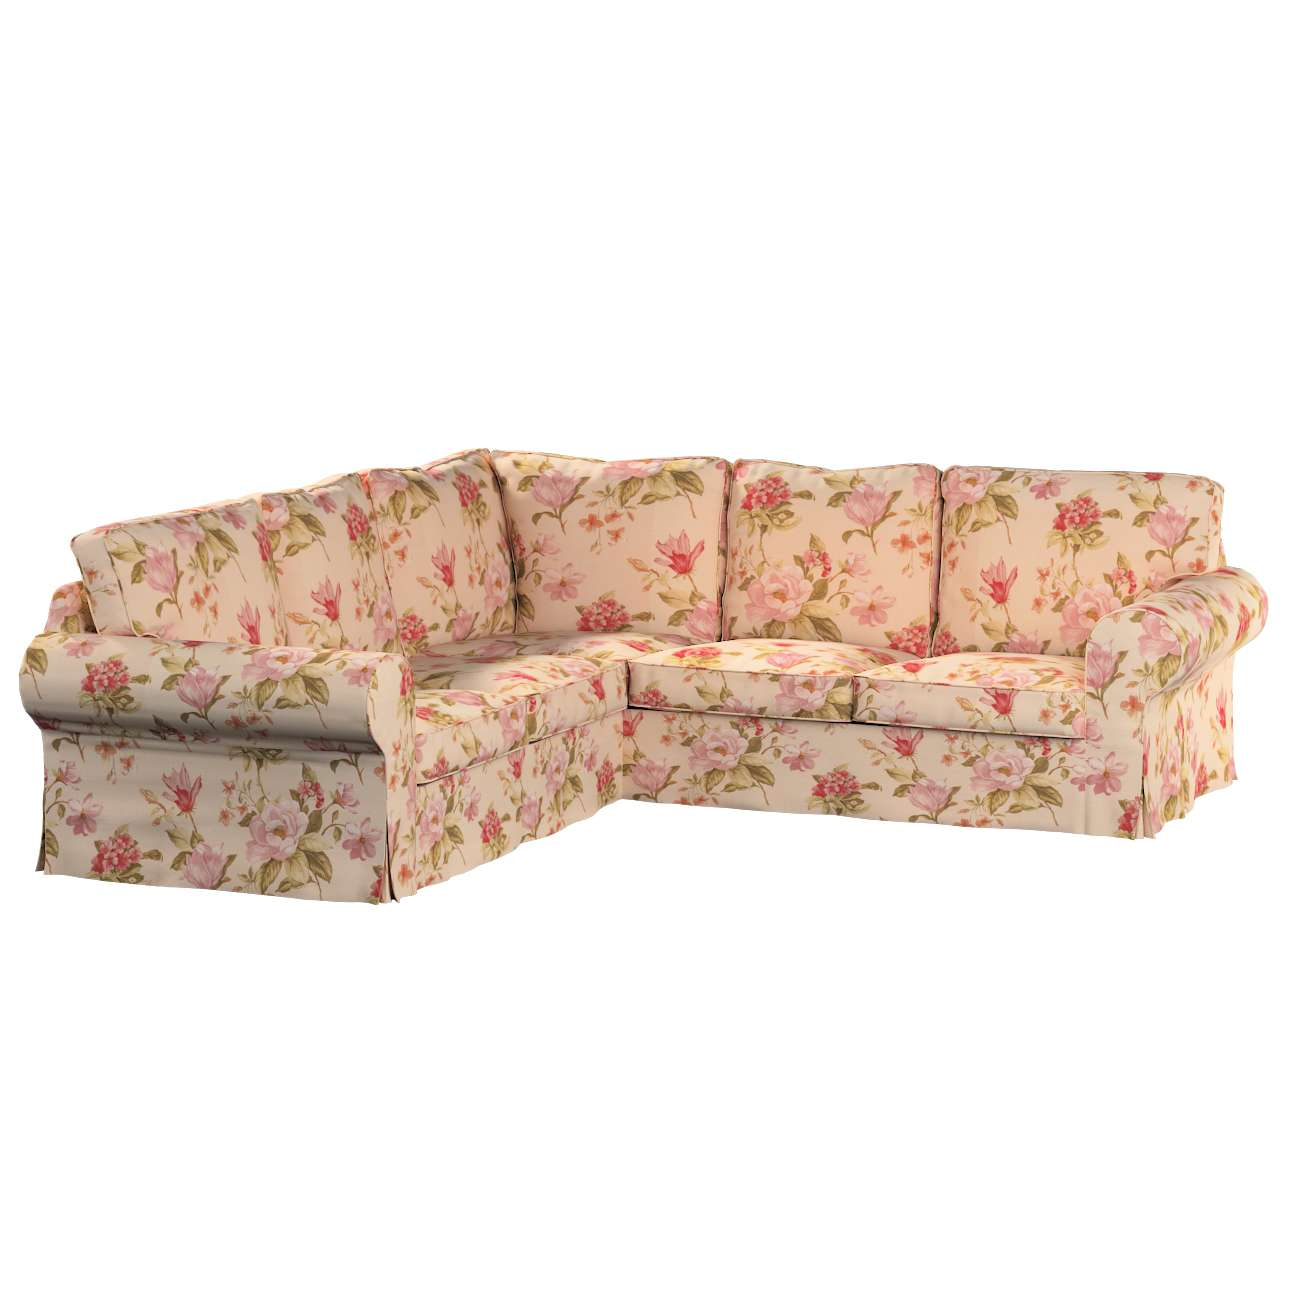 Ektorp kampinė sofa Ektorp kampinė sofa kolekcijoje Londres, audinys: 123-05